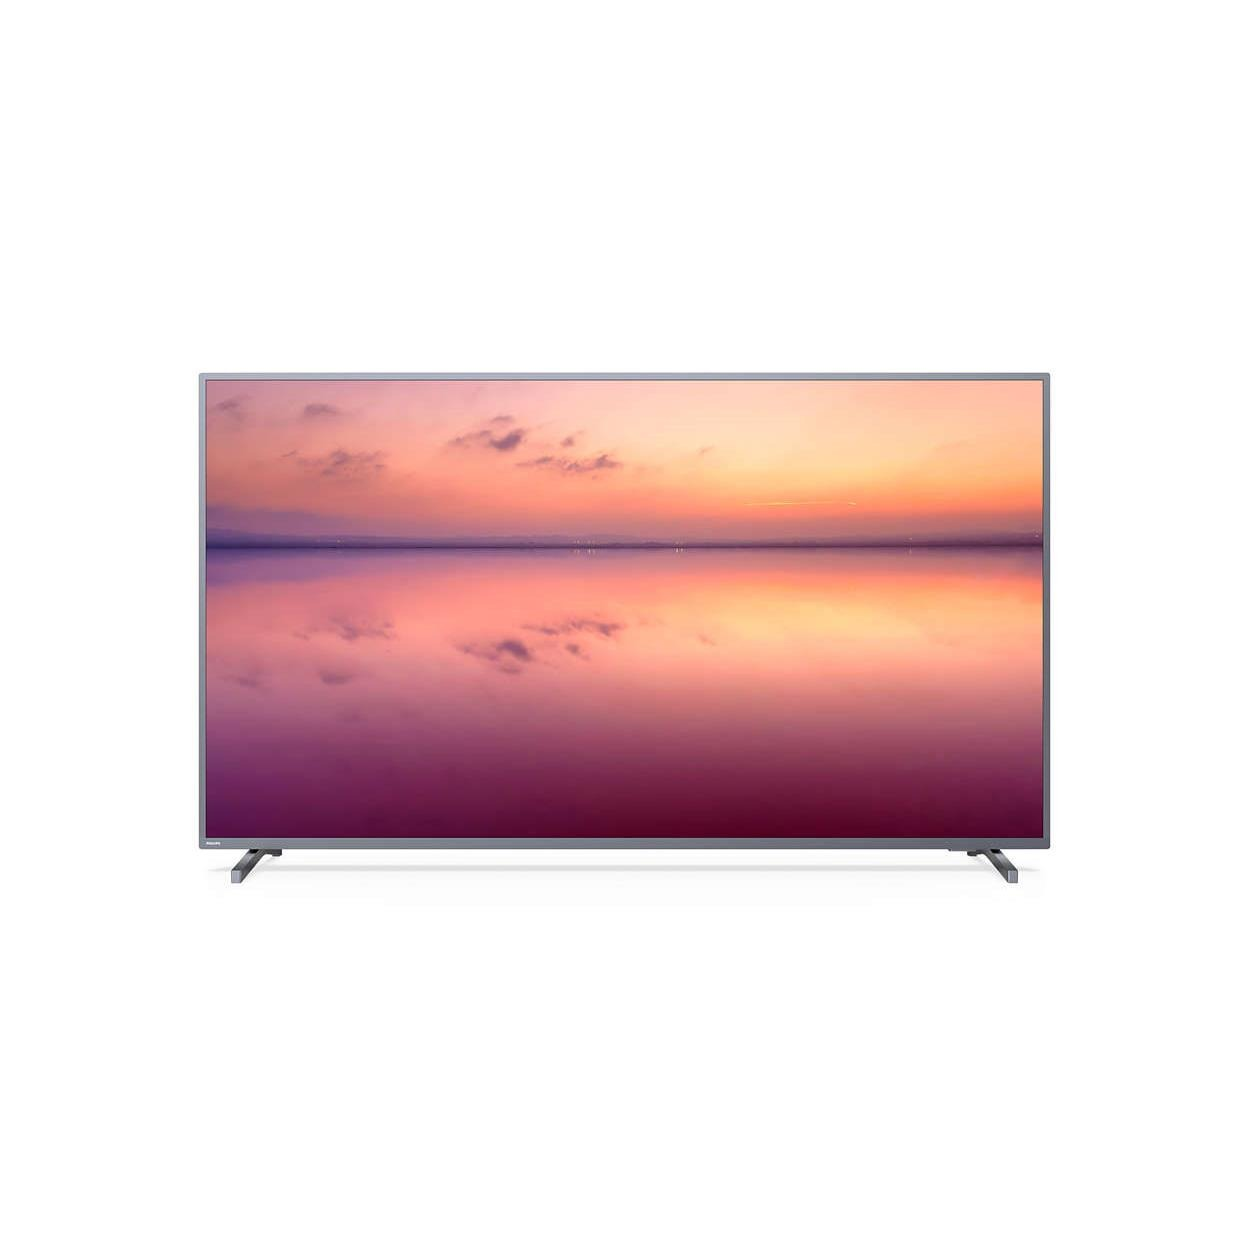 Smart TV LED 70 Philips Tv 4KUltra HD 70PUG677478 - Conversor Digital Wi-Fi 3 HDMI 2 USB